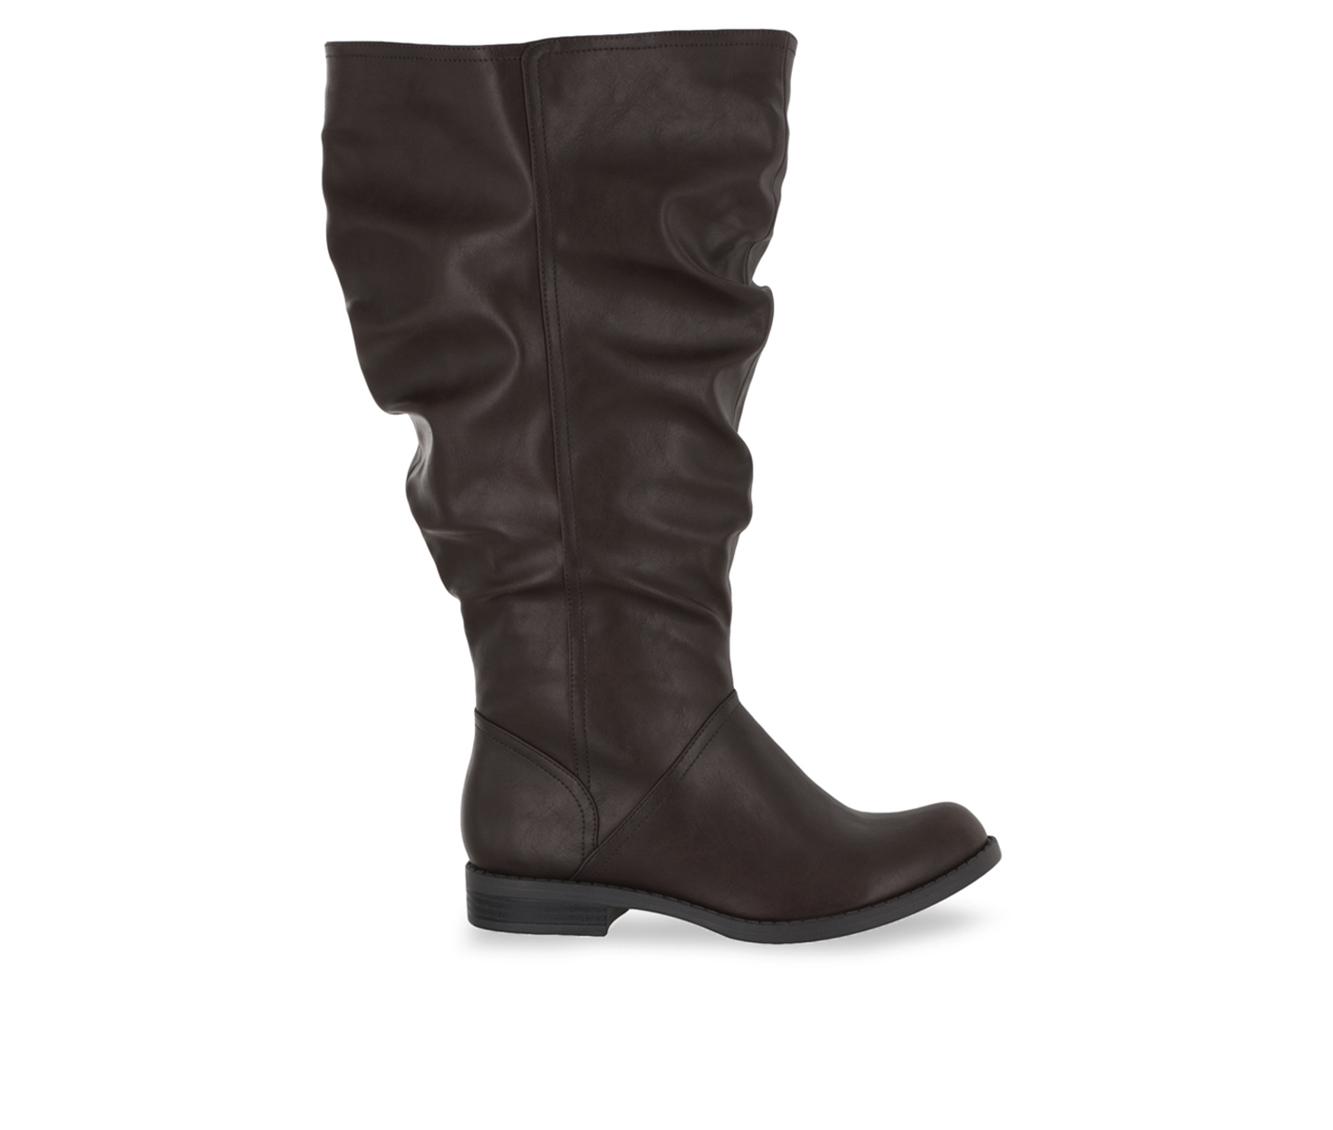 Easy Street Peak Plus Plus Women's Boot (Brown Faux Leather)